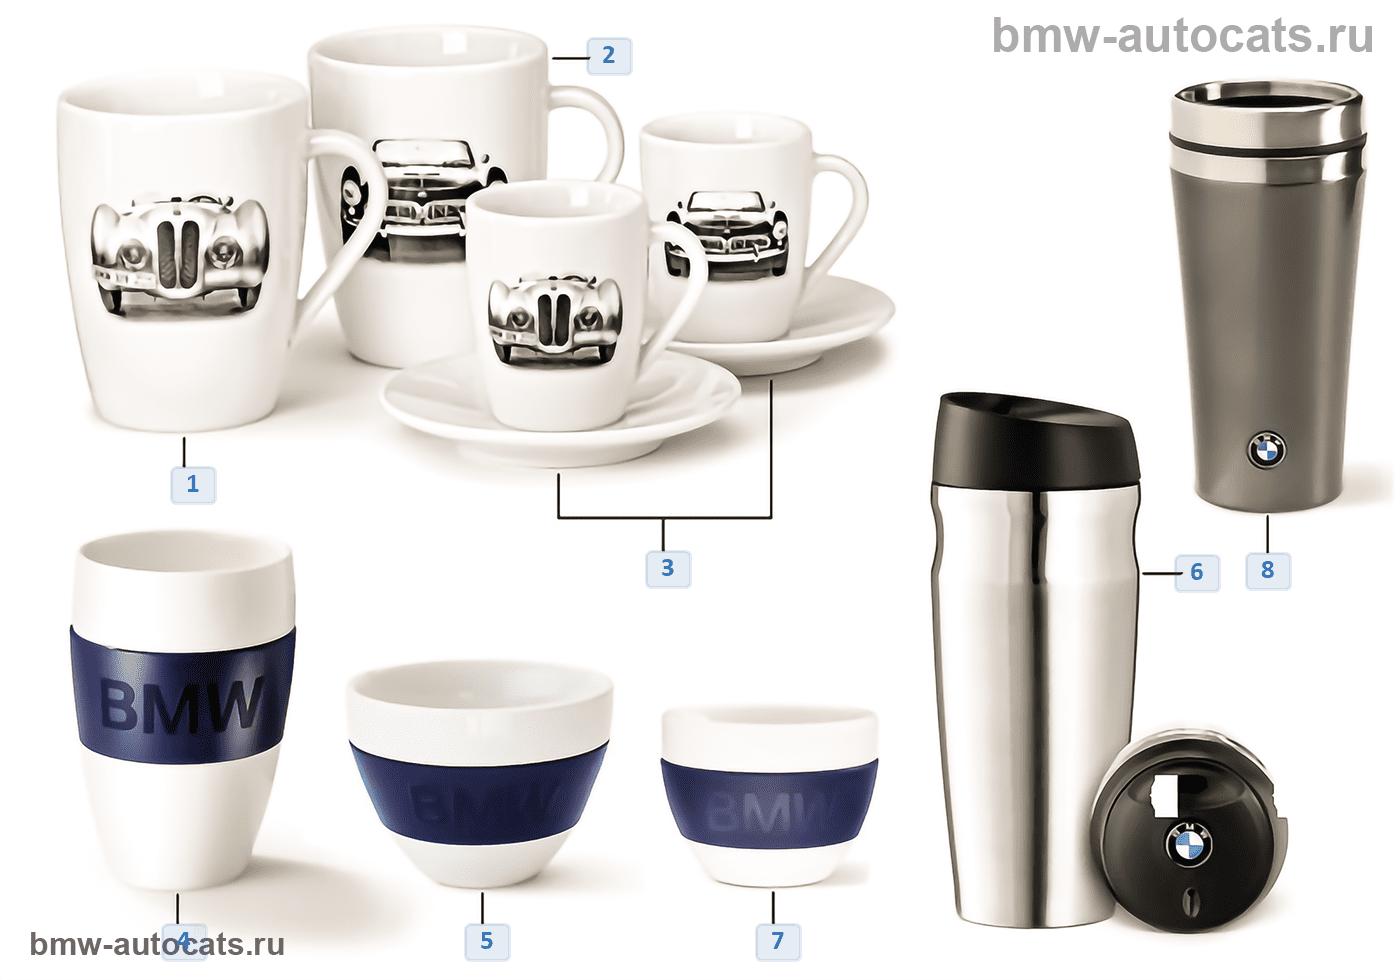 BMW Coll. — Чашки/кружки 14-16, 16-18